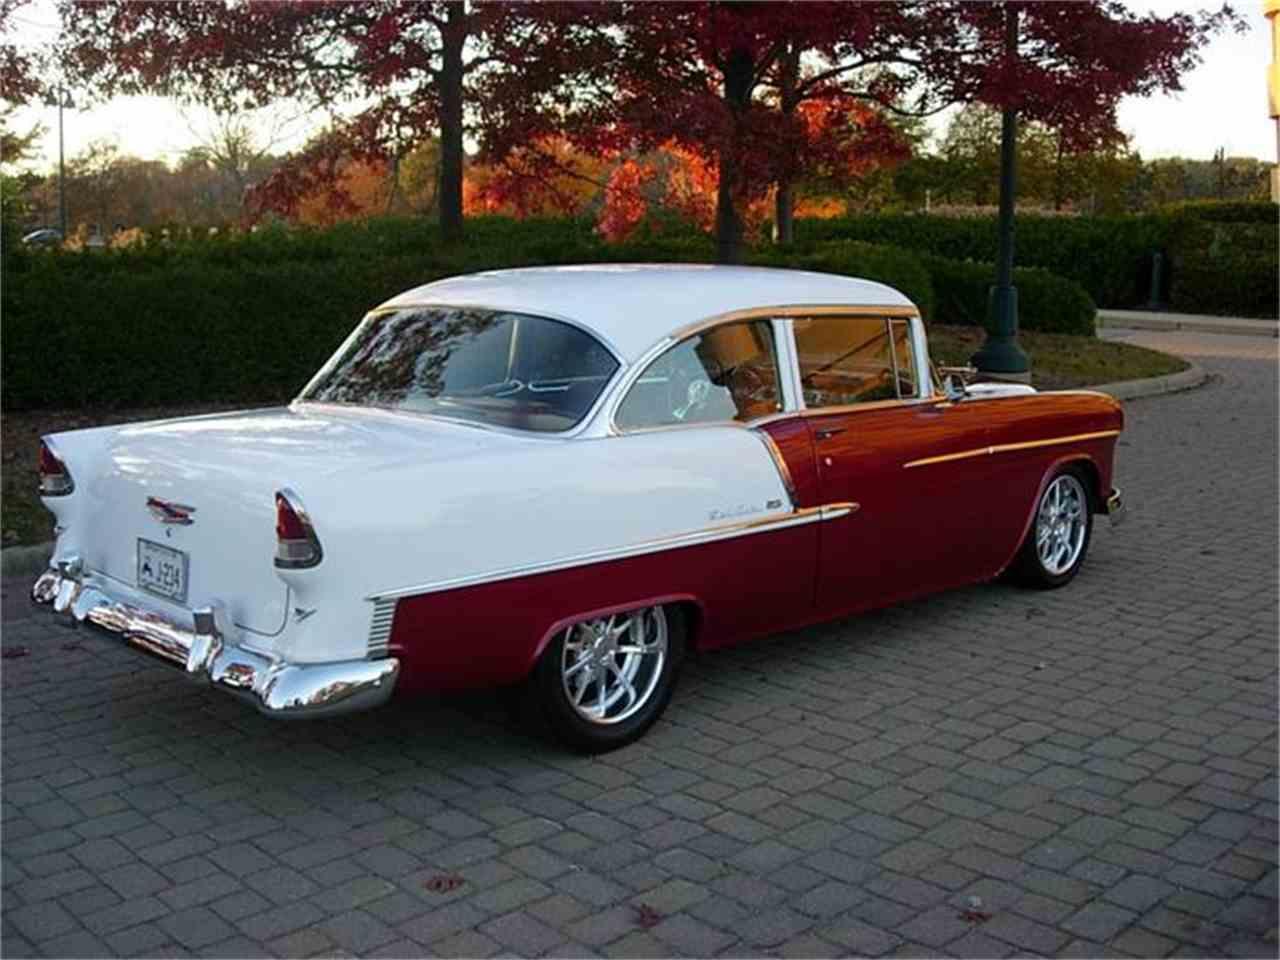 Chevrolet Ohio Dealers | Upcomingcarshq.com